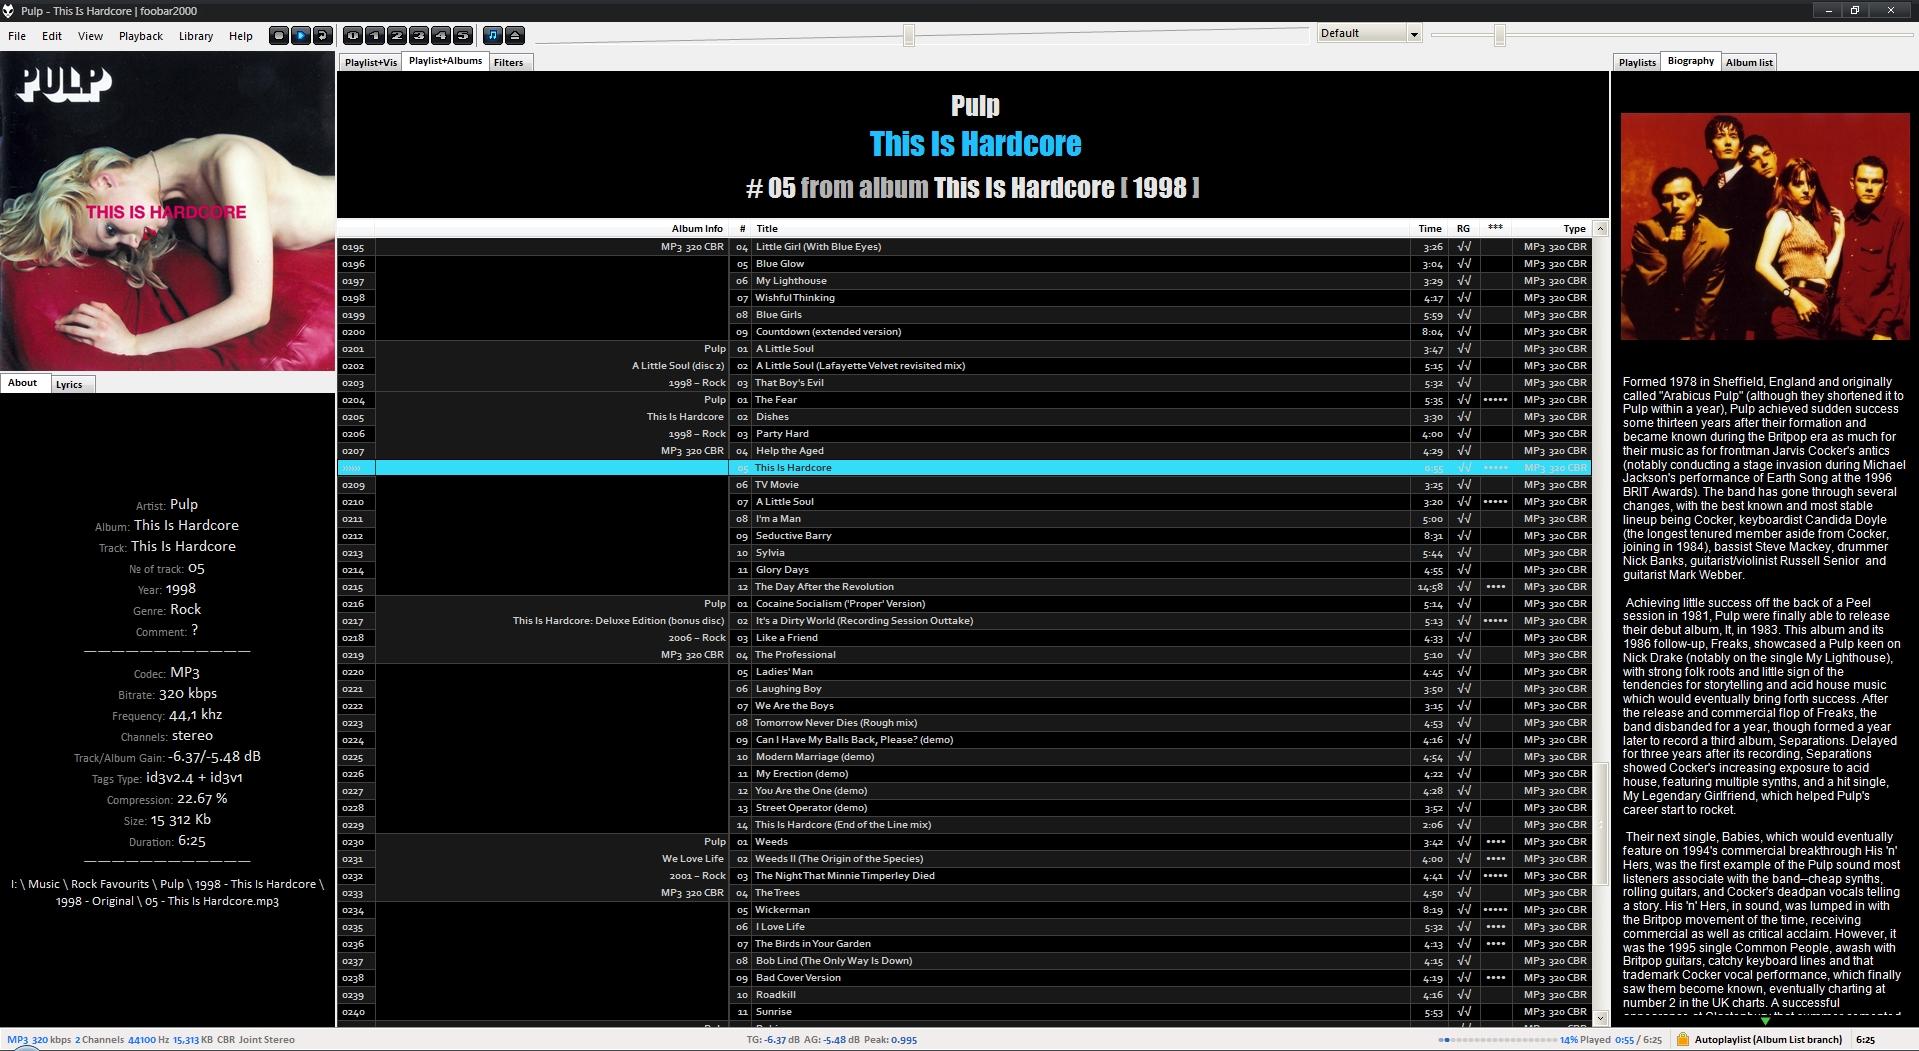 foobar2000 in 2009-2020 - black-blue custom theme for Brumal config, album mode, biography